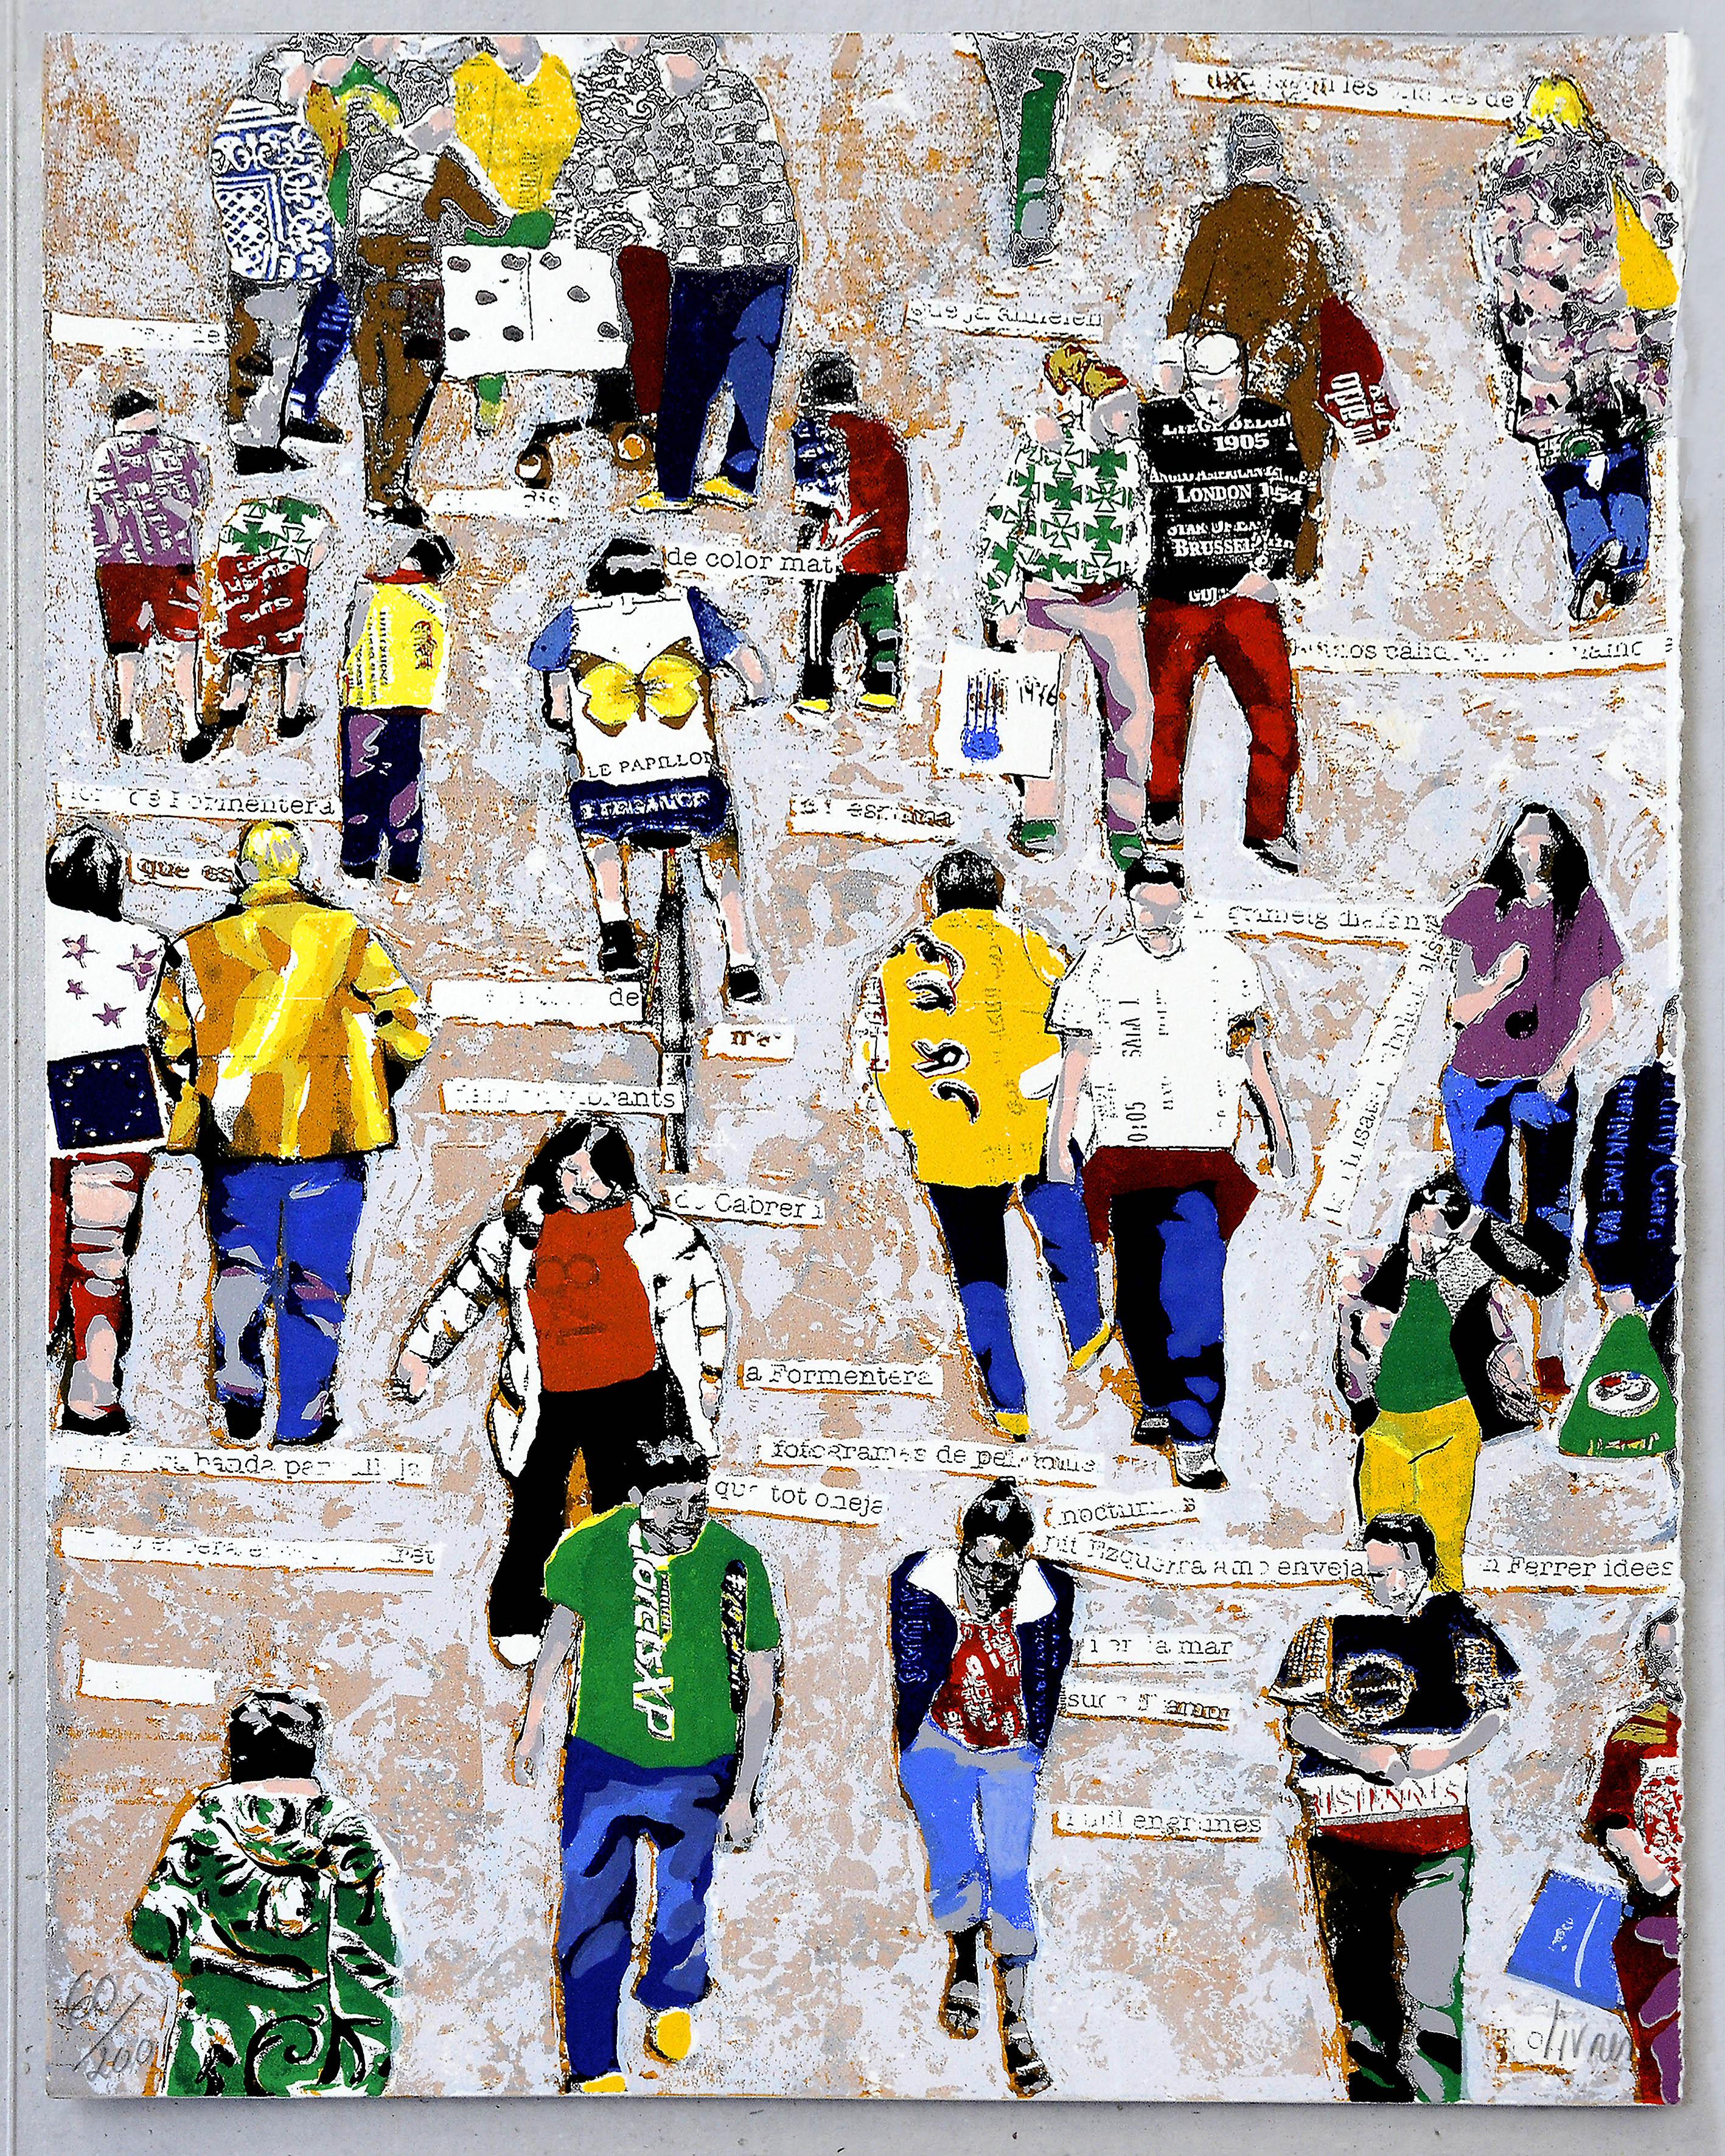 Cartell de la Setmana de la Poesia de Barcelona 2006 de Miguel Olivares